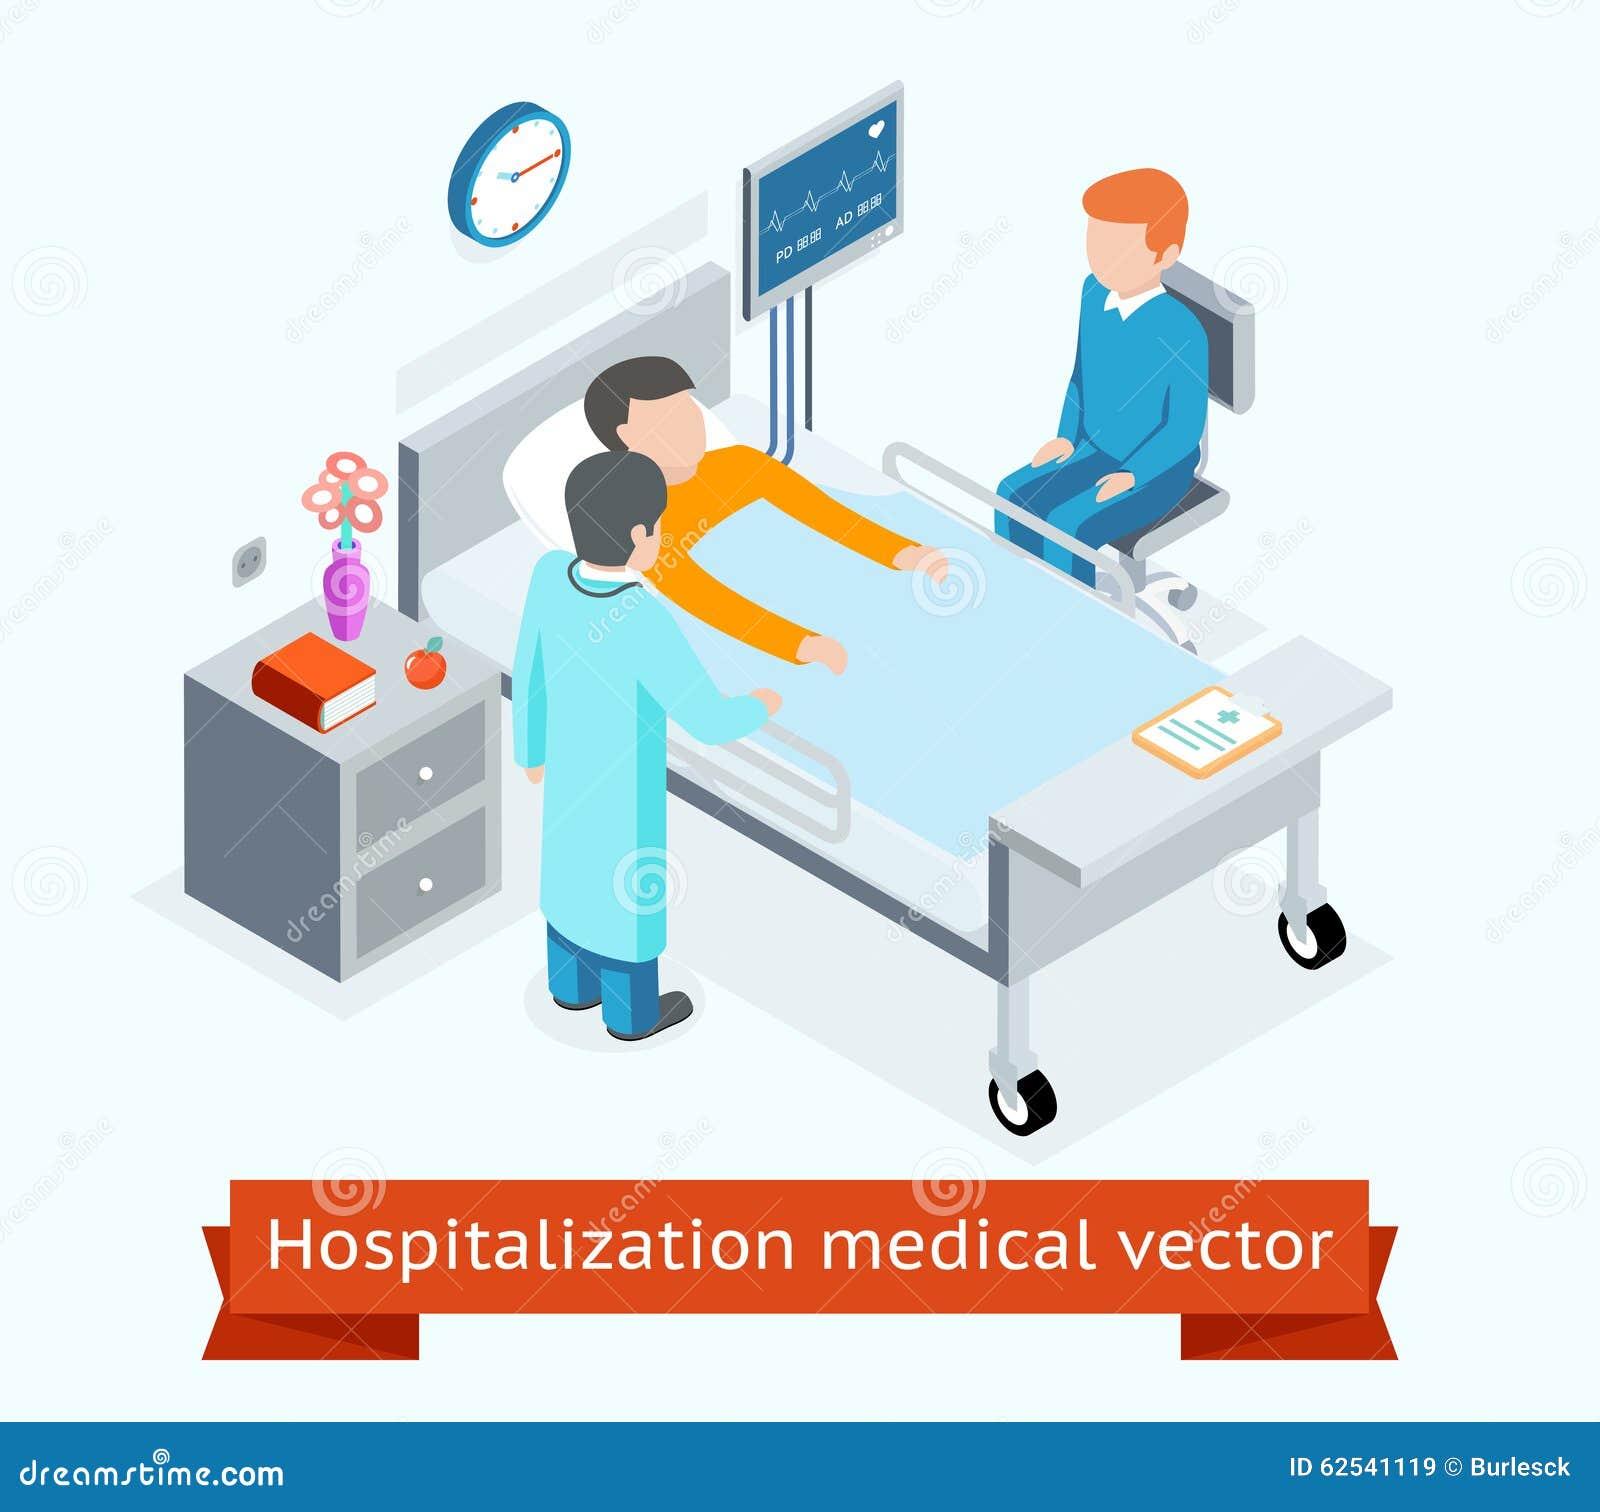 Image Result For Hospital Bed Cartoon